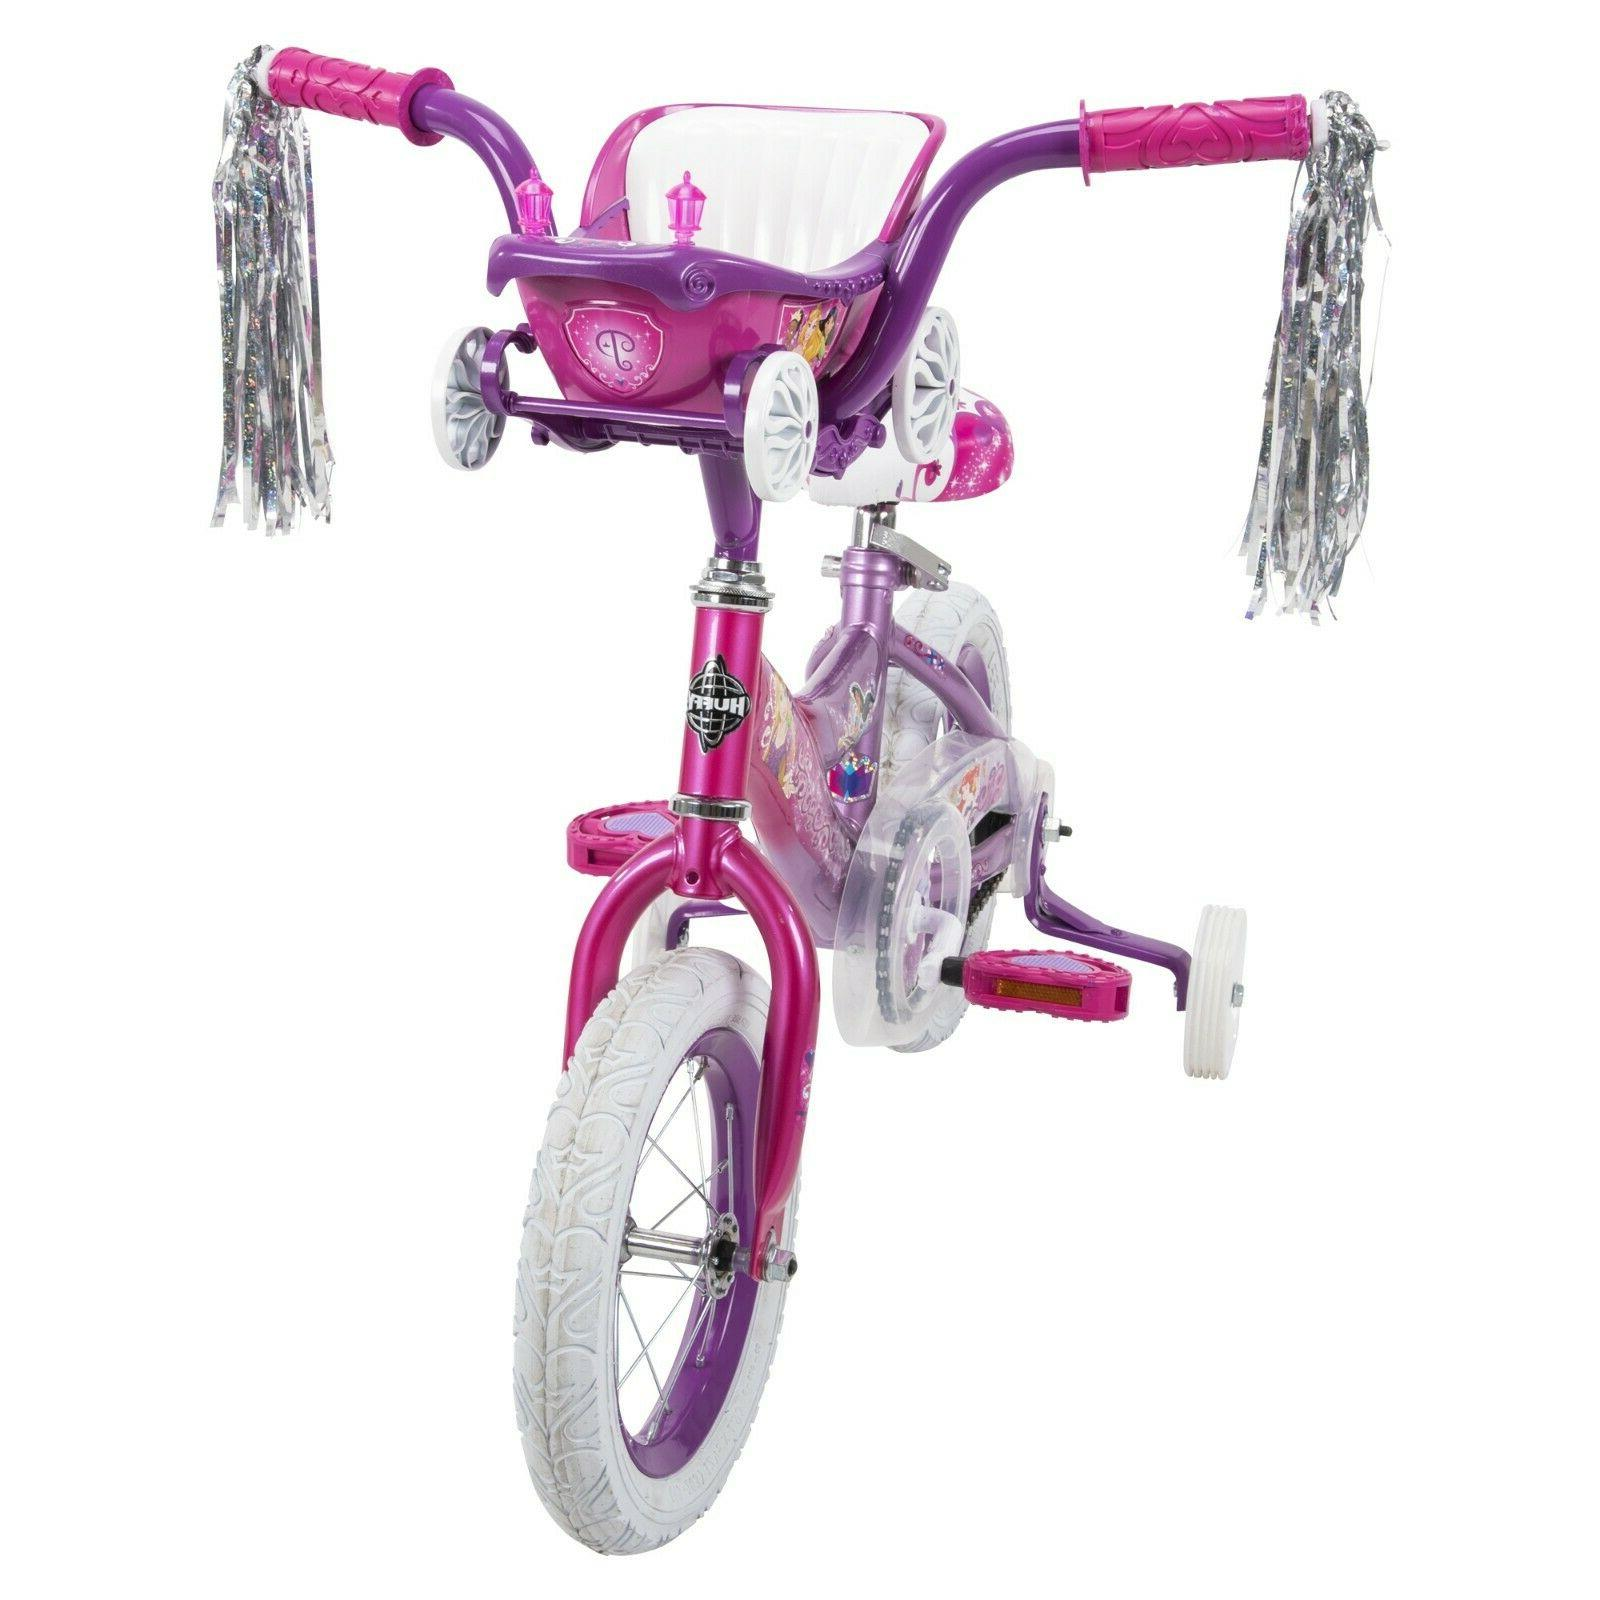 Huffy Bike with